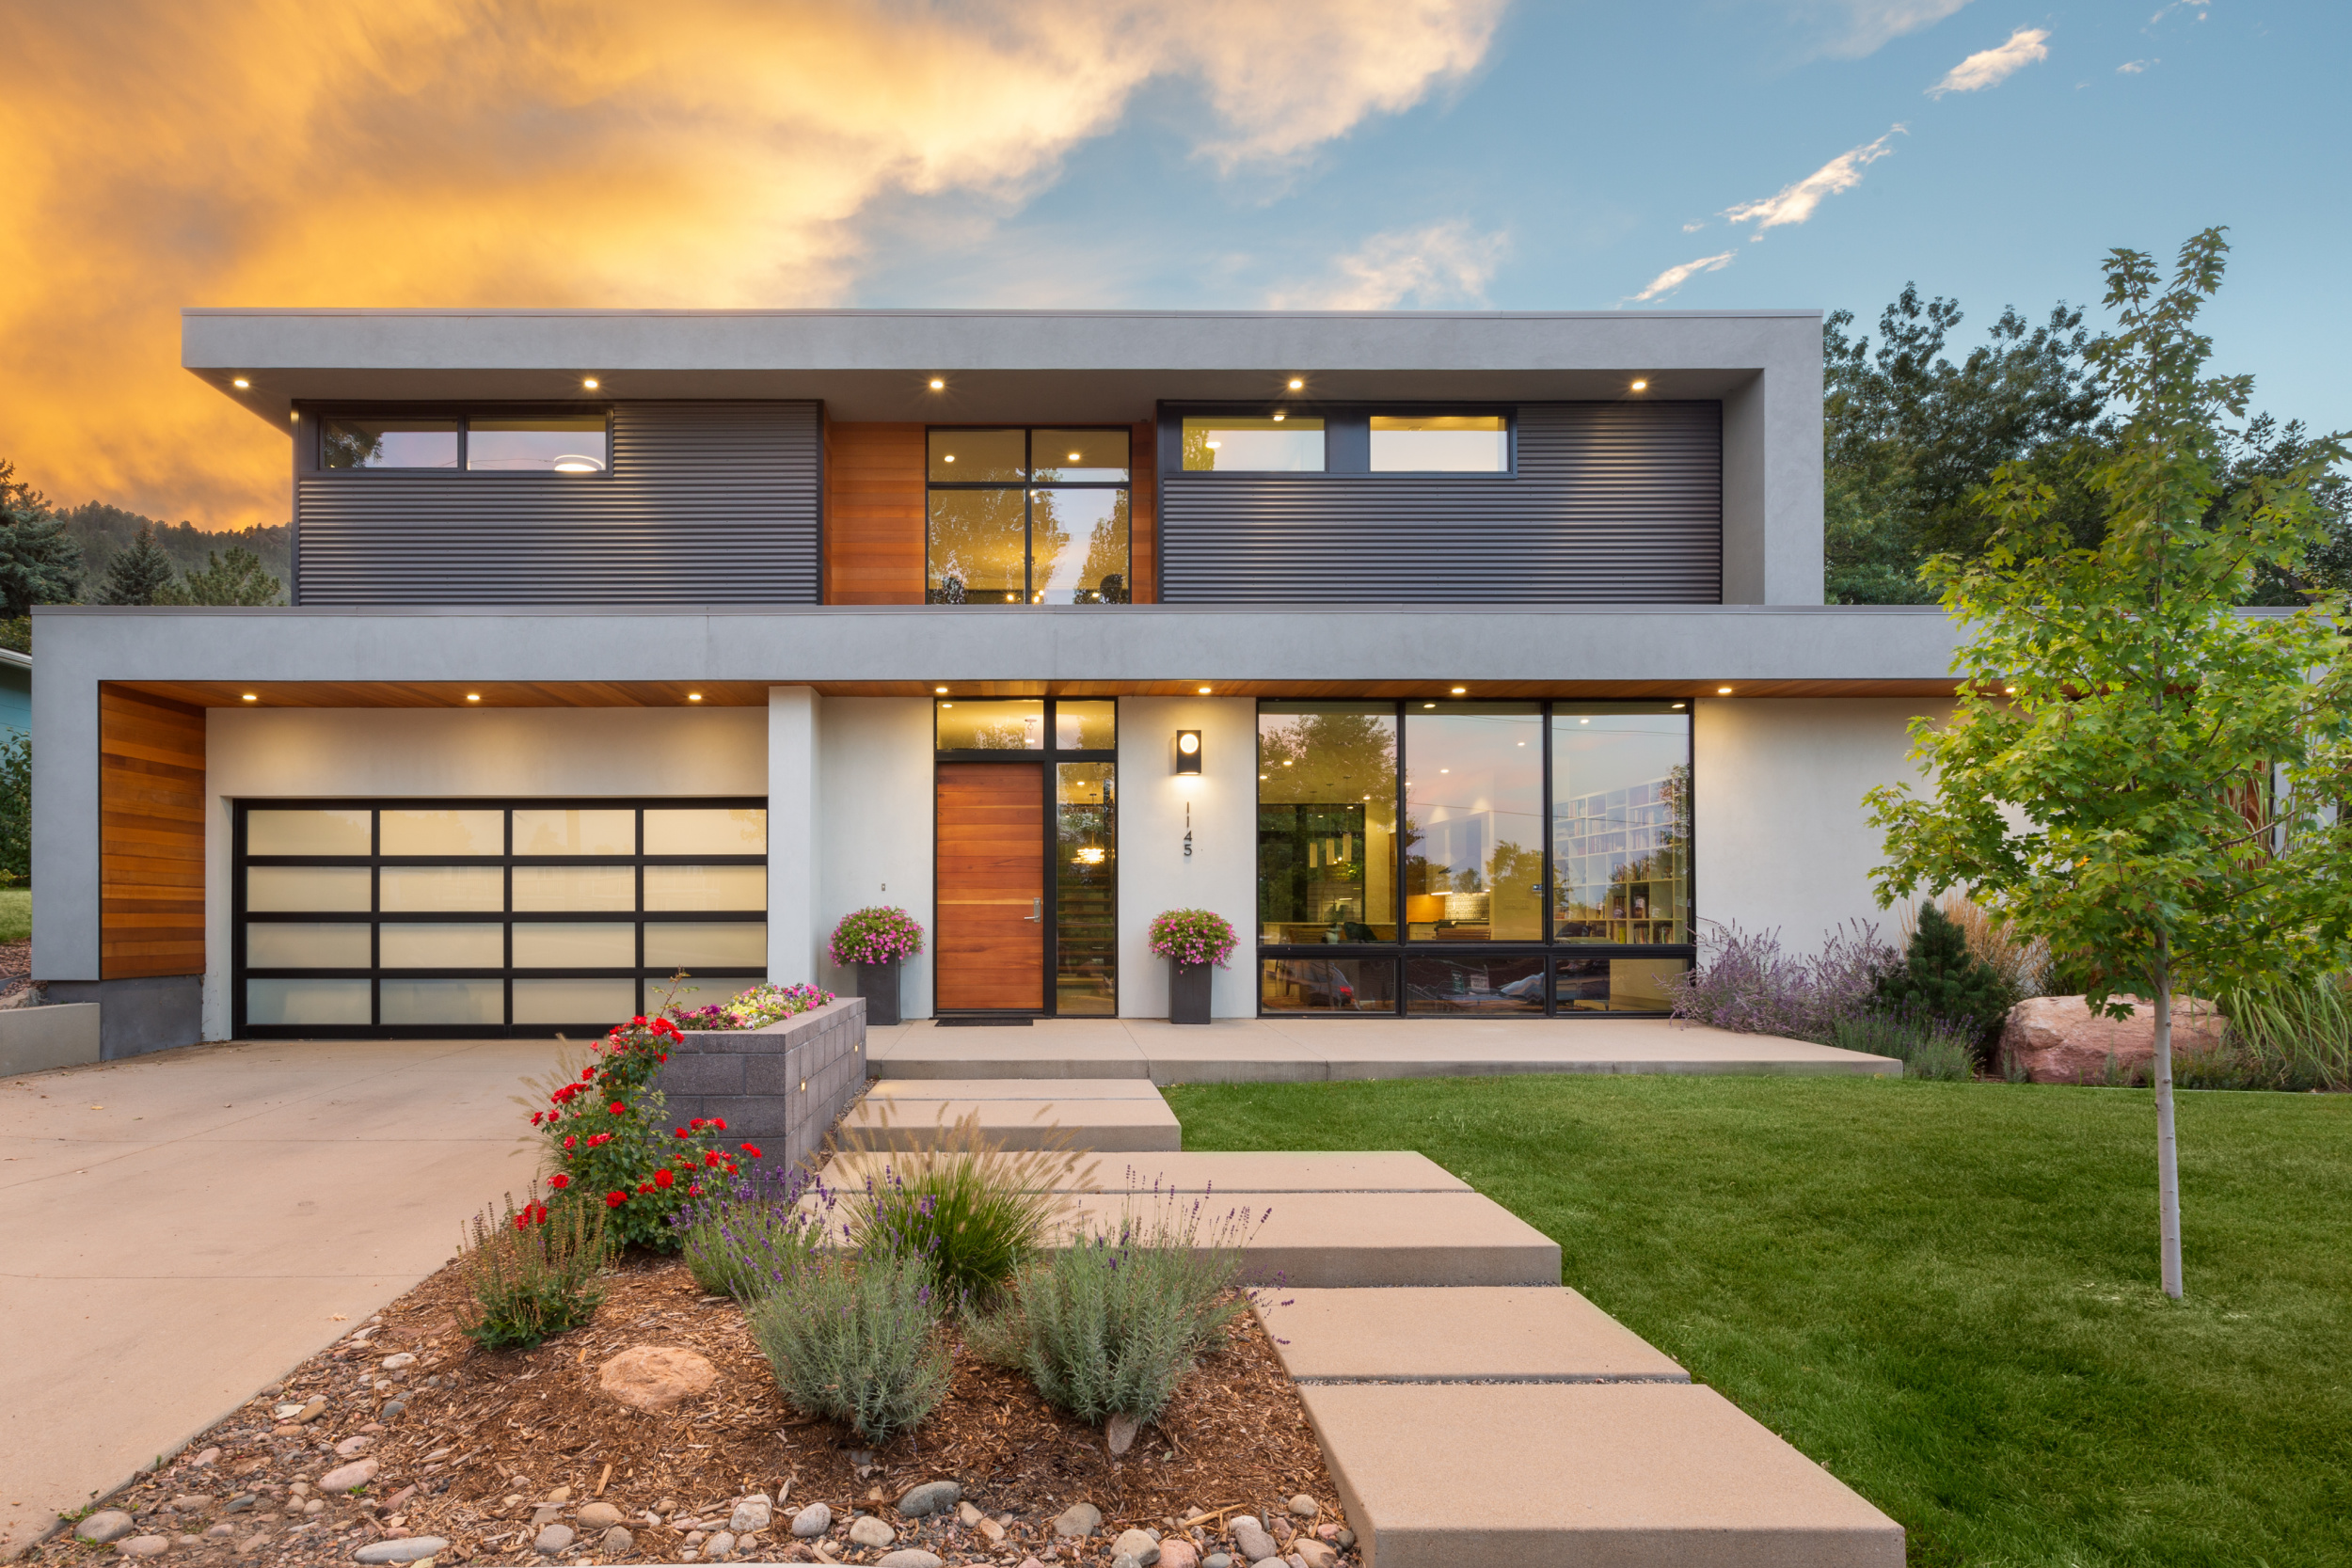 Melton Design uild - Custom Home Exterior Photo at Sunset